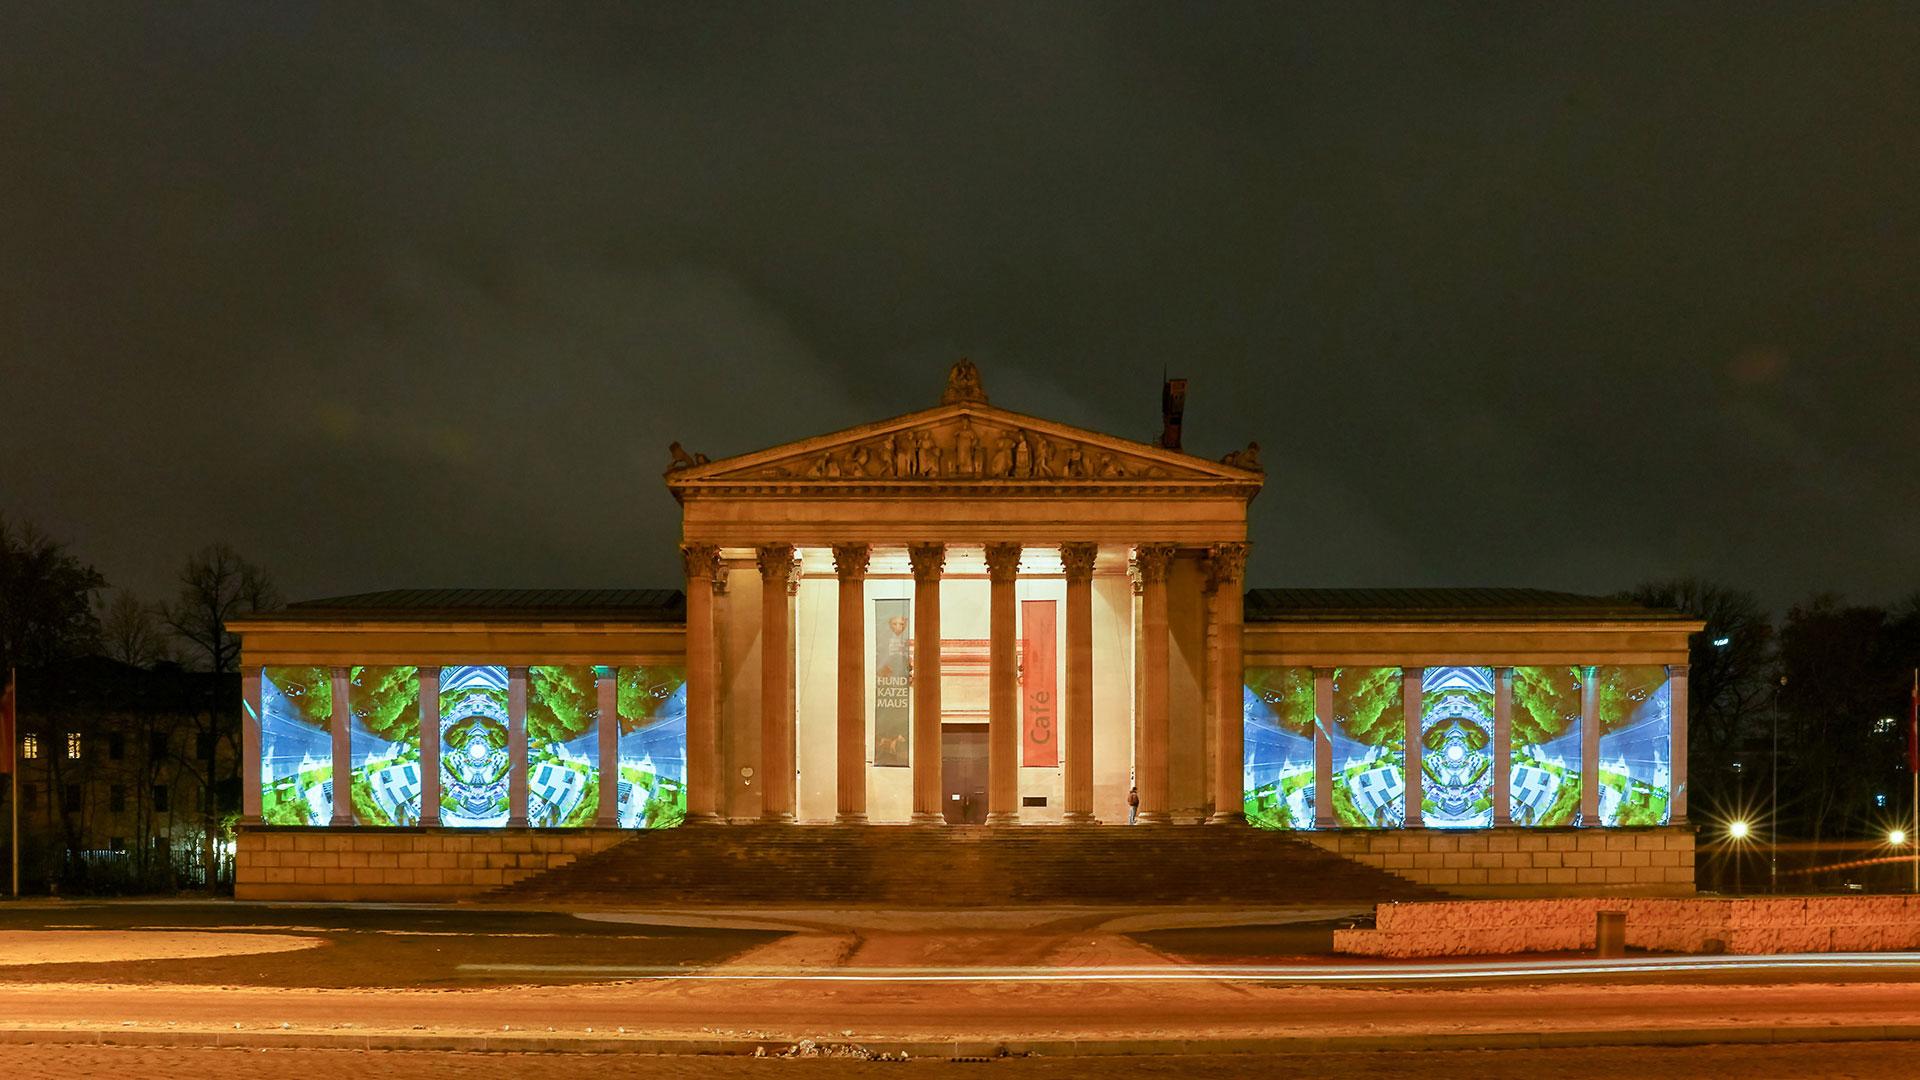 INSIDE OUT Antikensammlung Lichtaktion Kunstareal verbindet